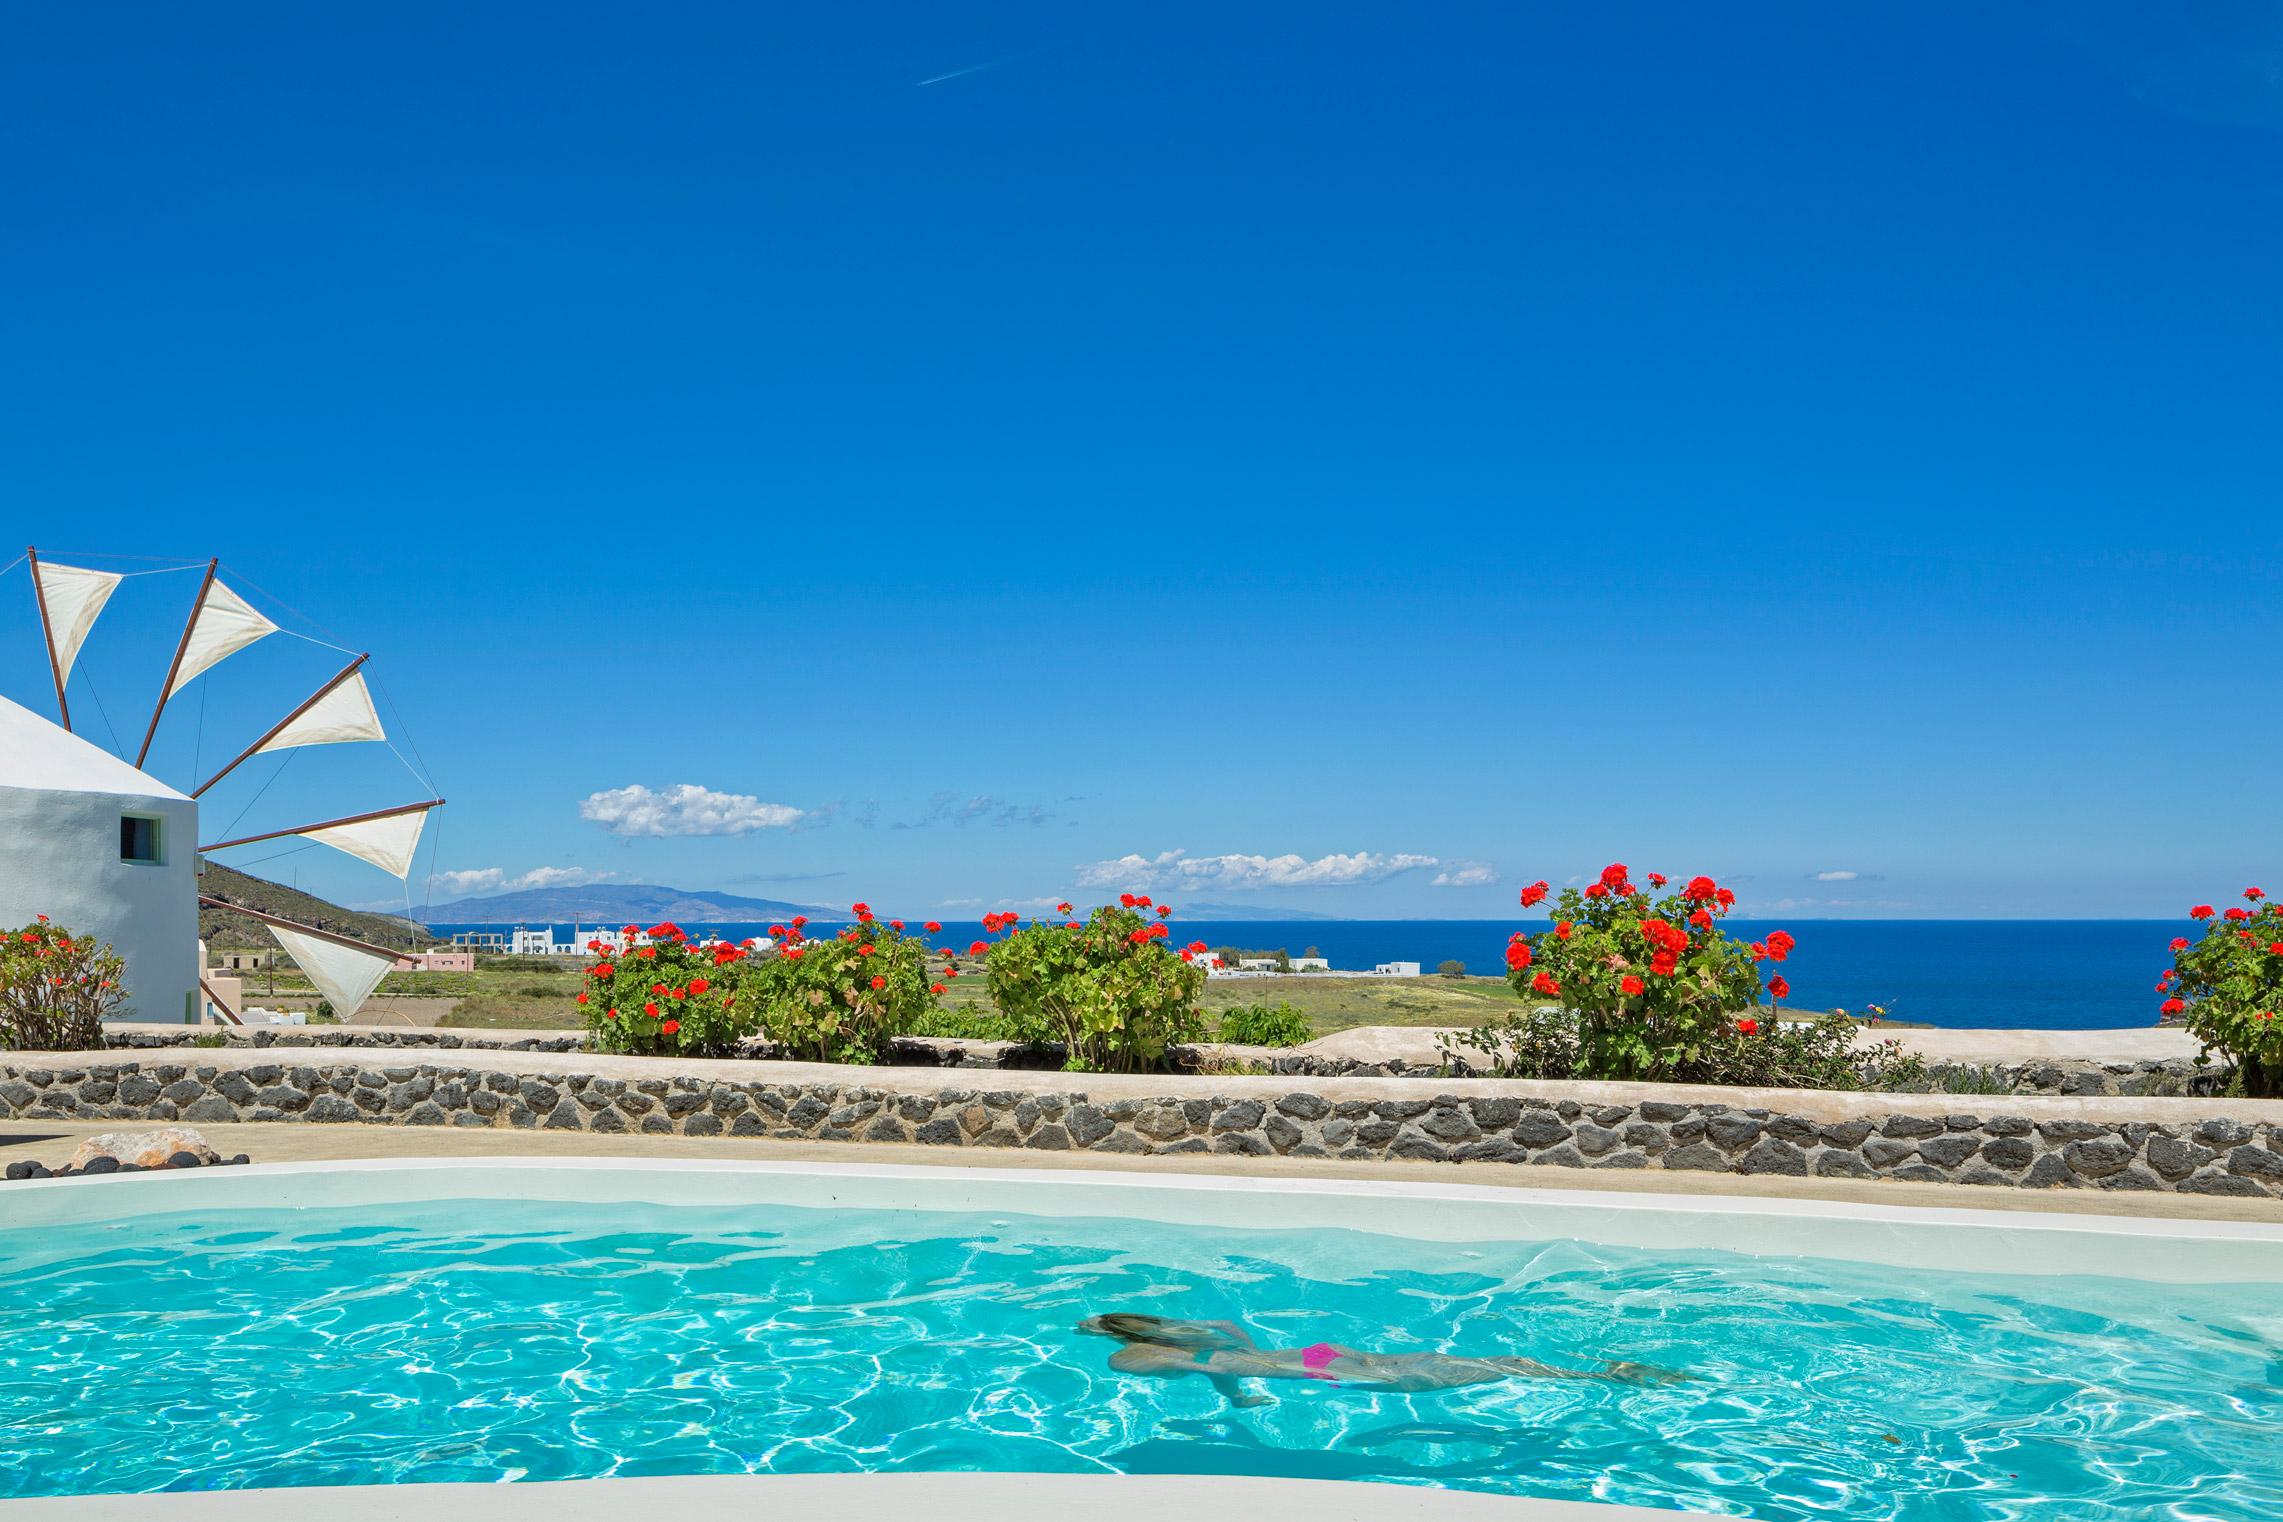 Location vacances villa moulin typique de santorin avec - Location vacances avec piscine privee ...